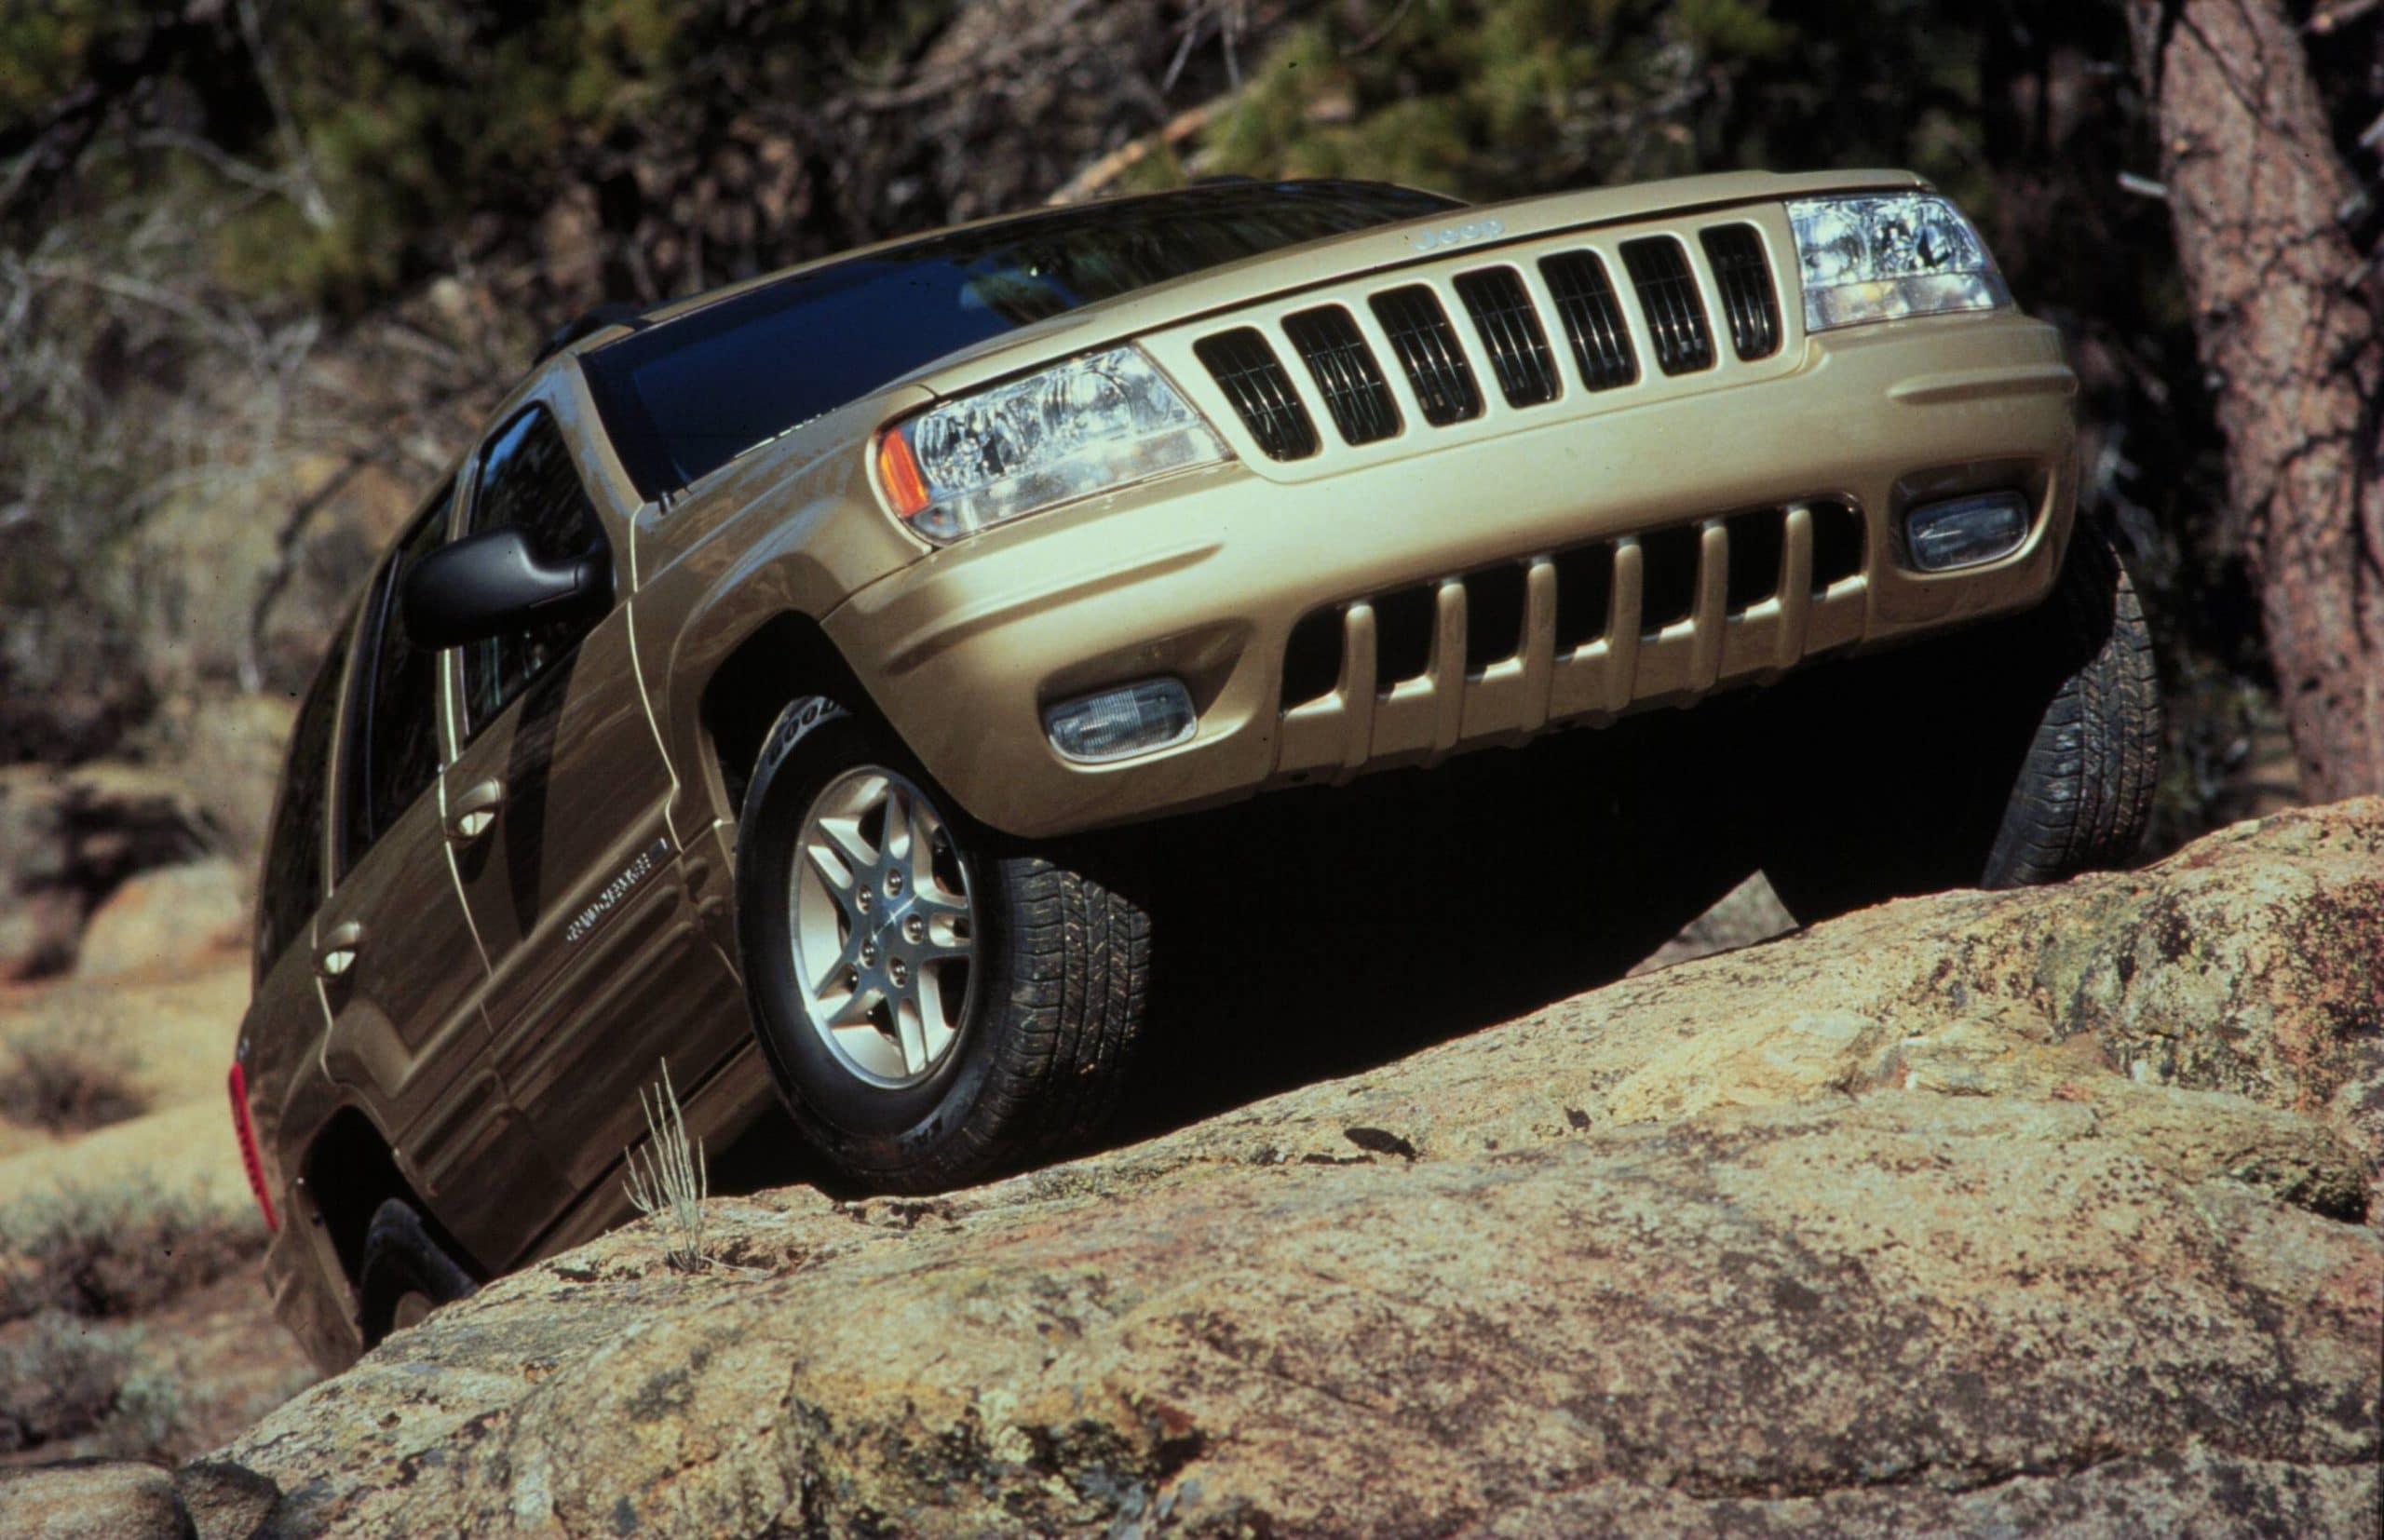 4th moment 1999 Jeep Grand Cherokee scaled 12 ορόσημα, για τα 80α γενέθλια της Jeep Jeep, Jeep Cherokee, Jeep Compass, Jeep Gladiator, Jeep Grand Cherokee, Jeep Renegade, Jeep Willys, Jeep Wrangler, ειδήσεις, Νέα